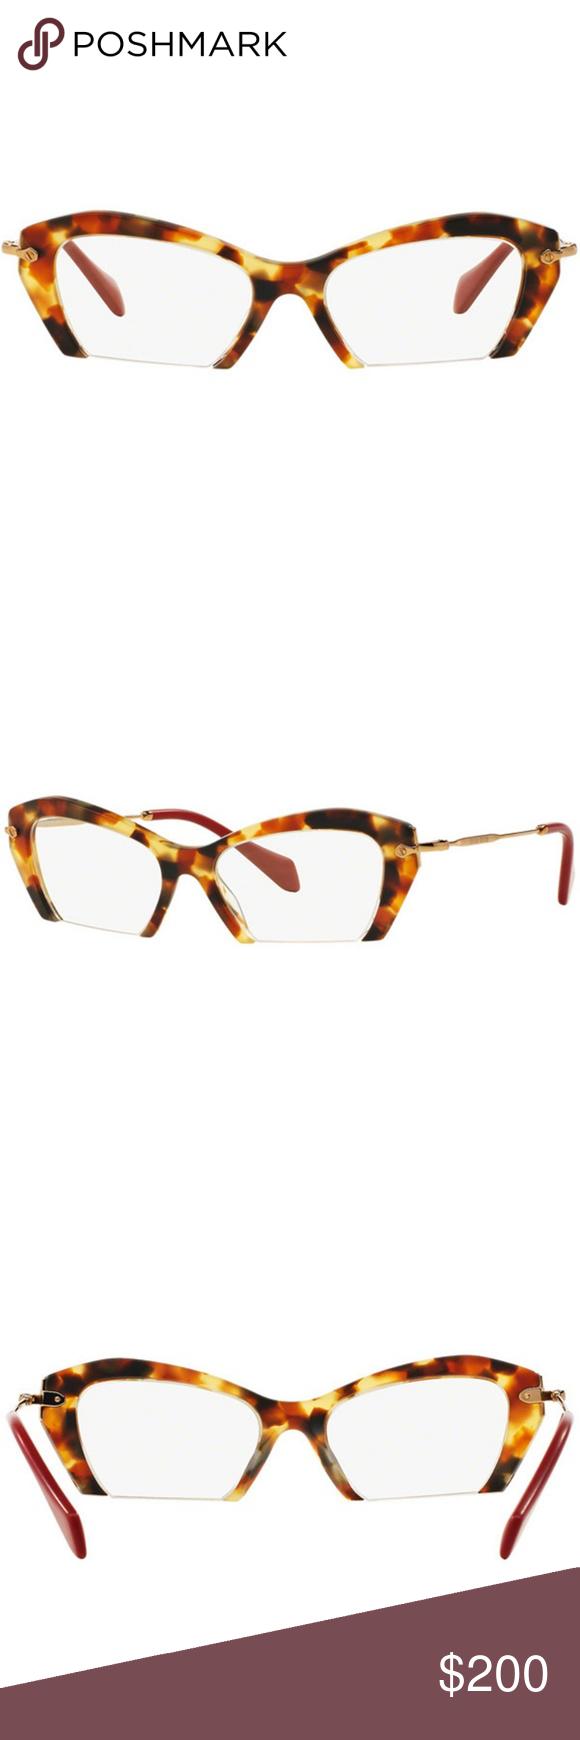 77f97eae8dba Miu Miu Cat Eye Havana Eyeglasses Brand  Miu Miu Model  MU03OV-UA51O1-